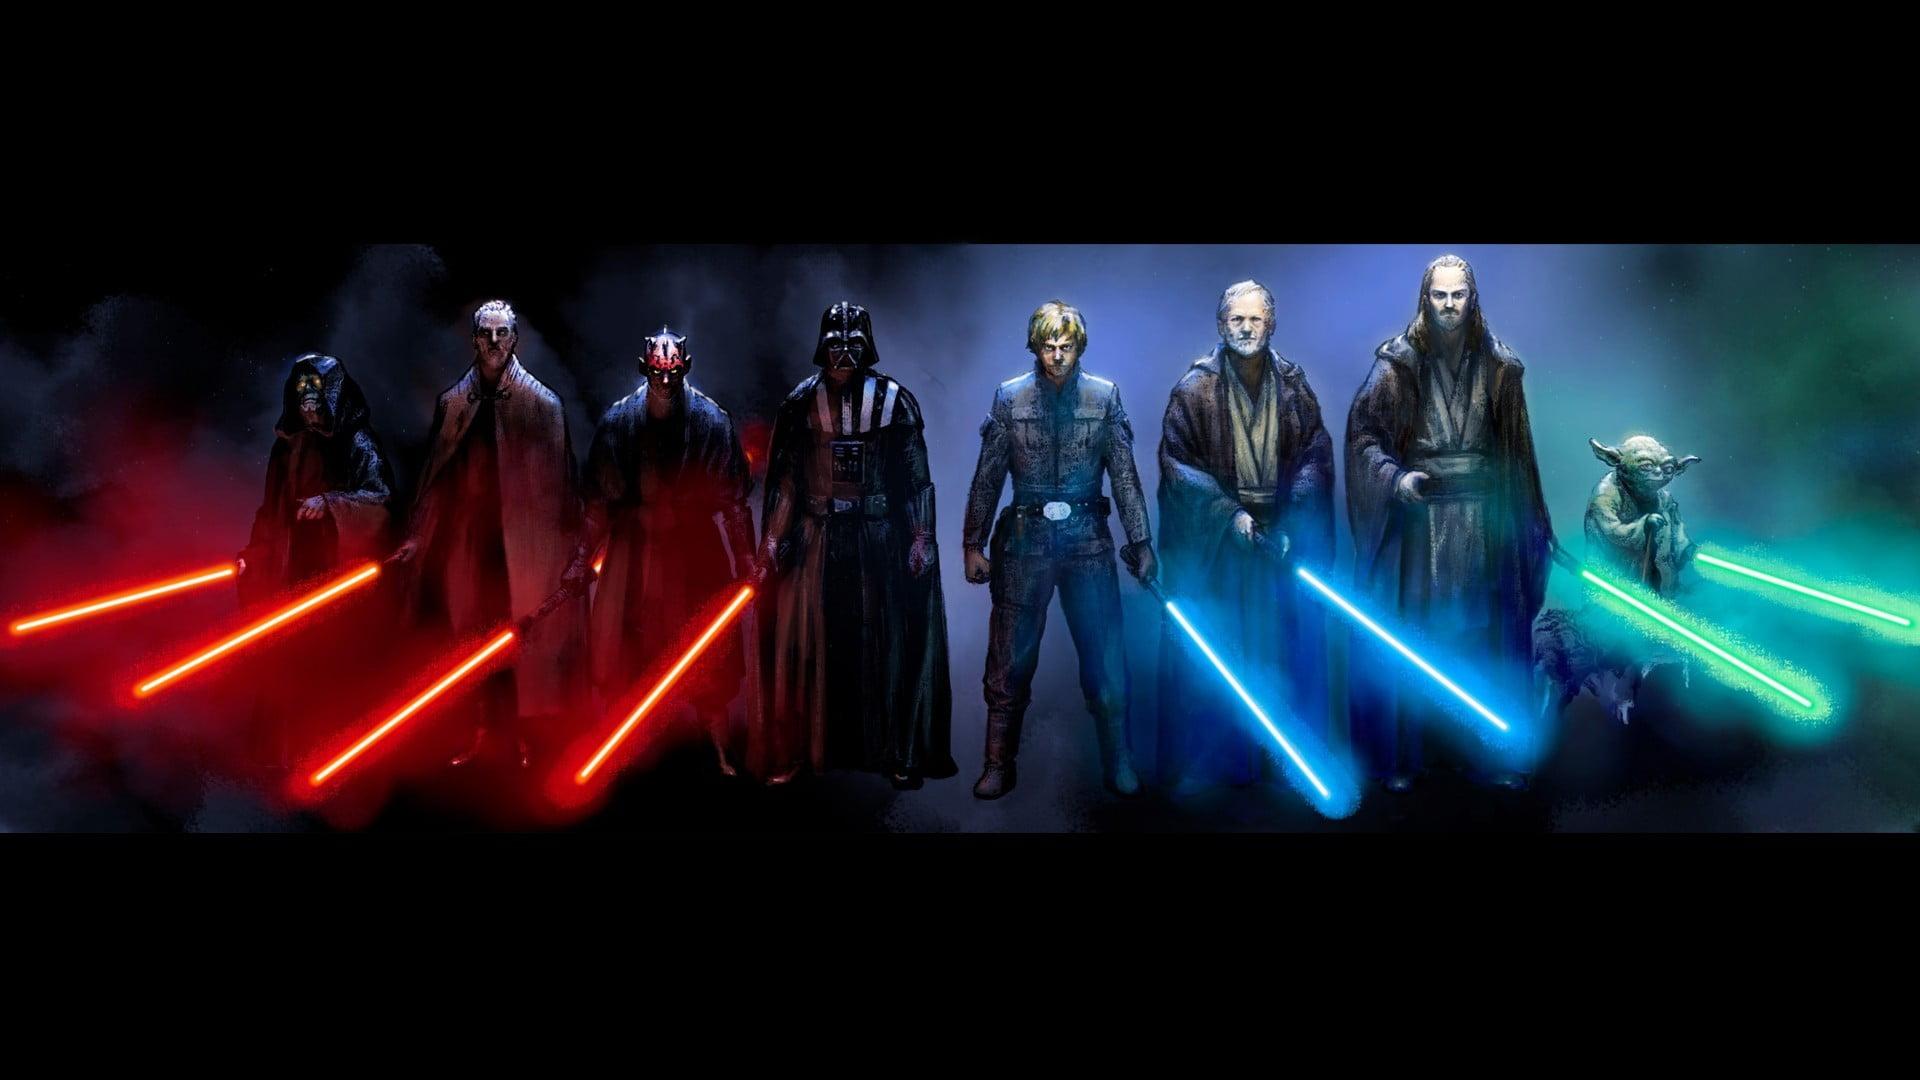 Wallpaper Star Wars lightsaber Yoda darkness 1920x1200